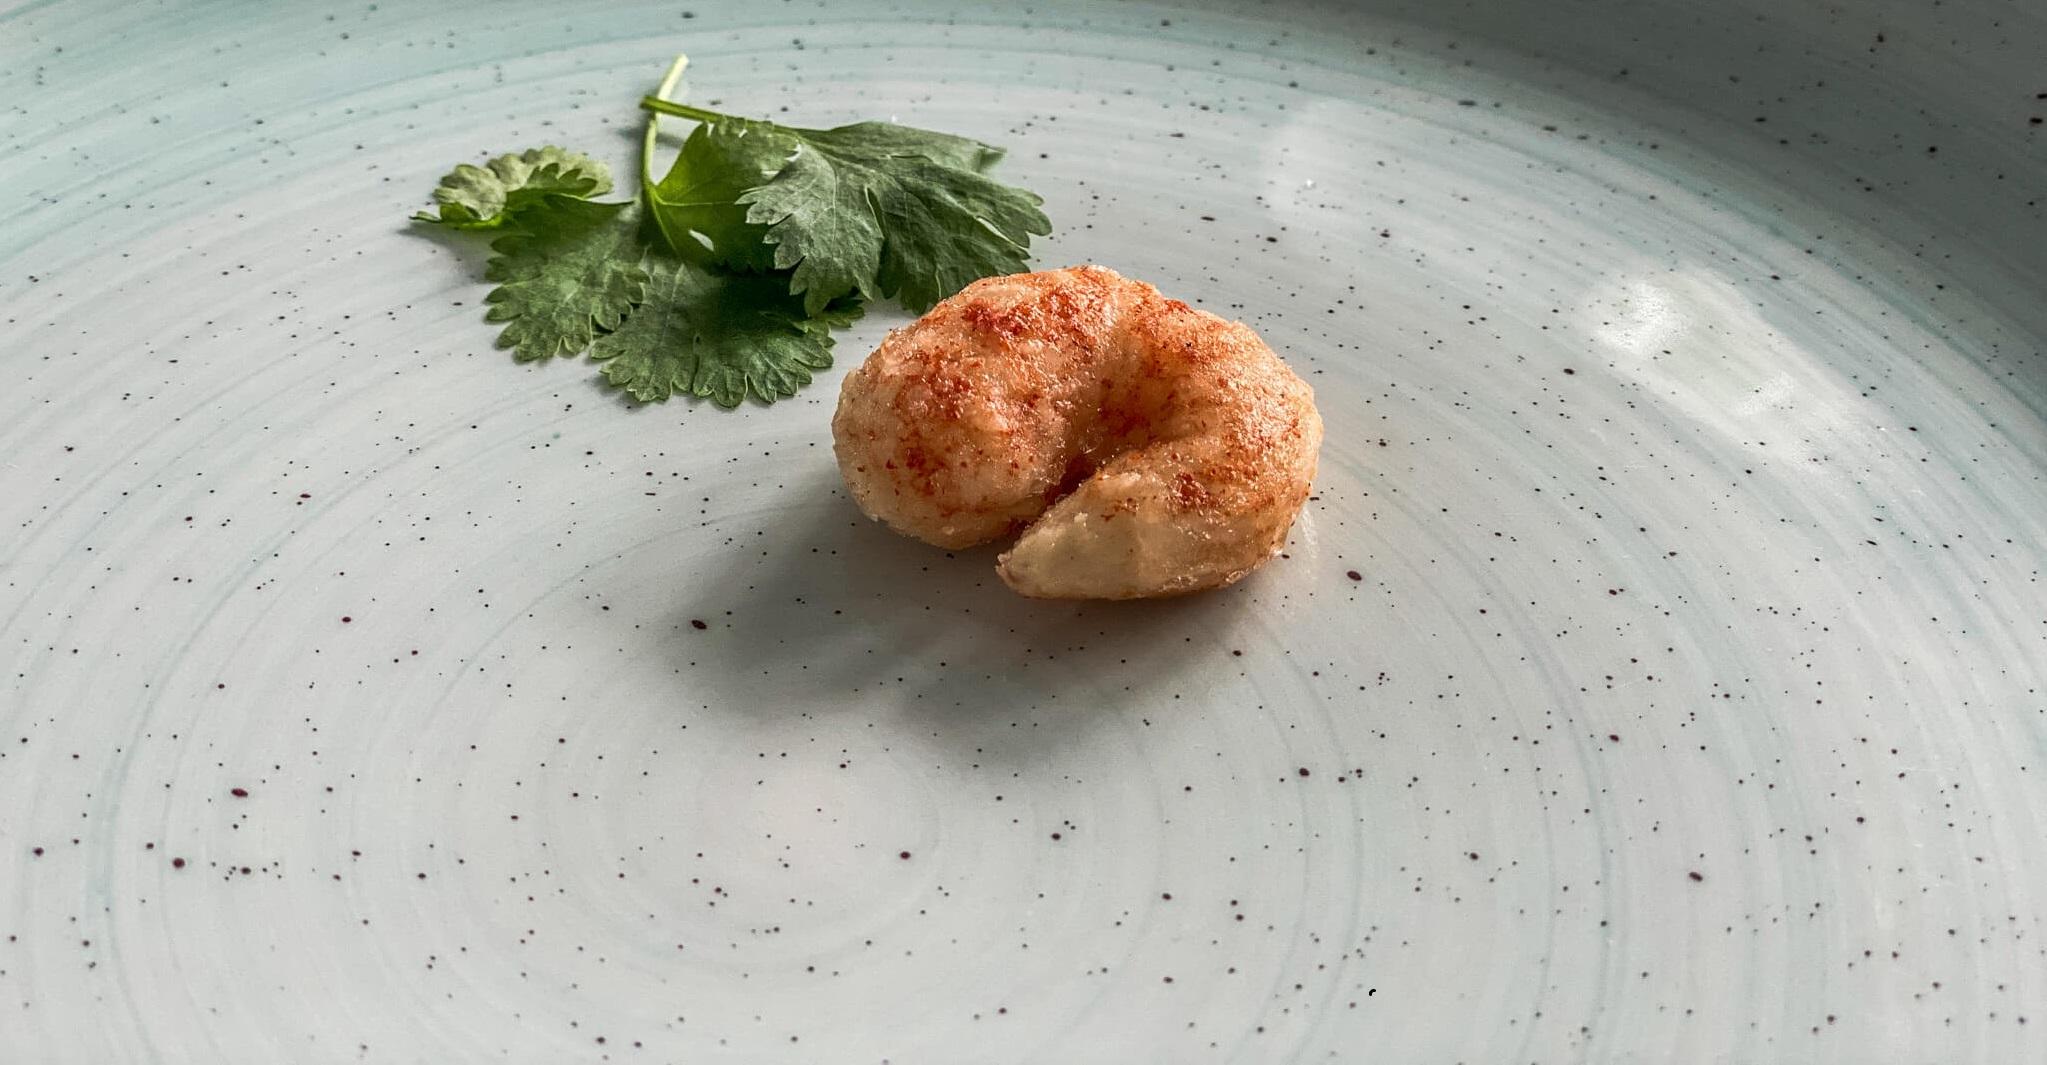 plant based fish, beyond fish as shrimp